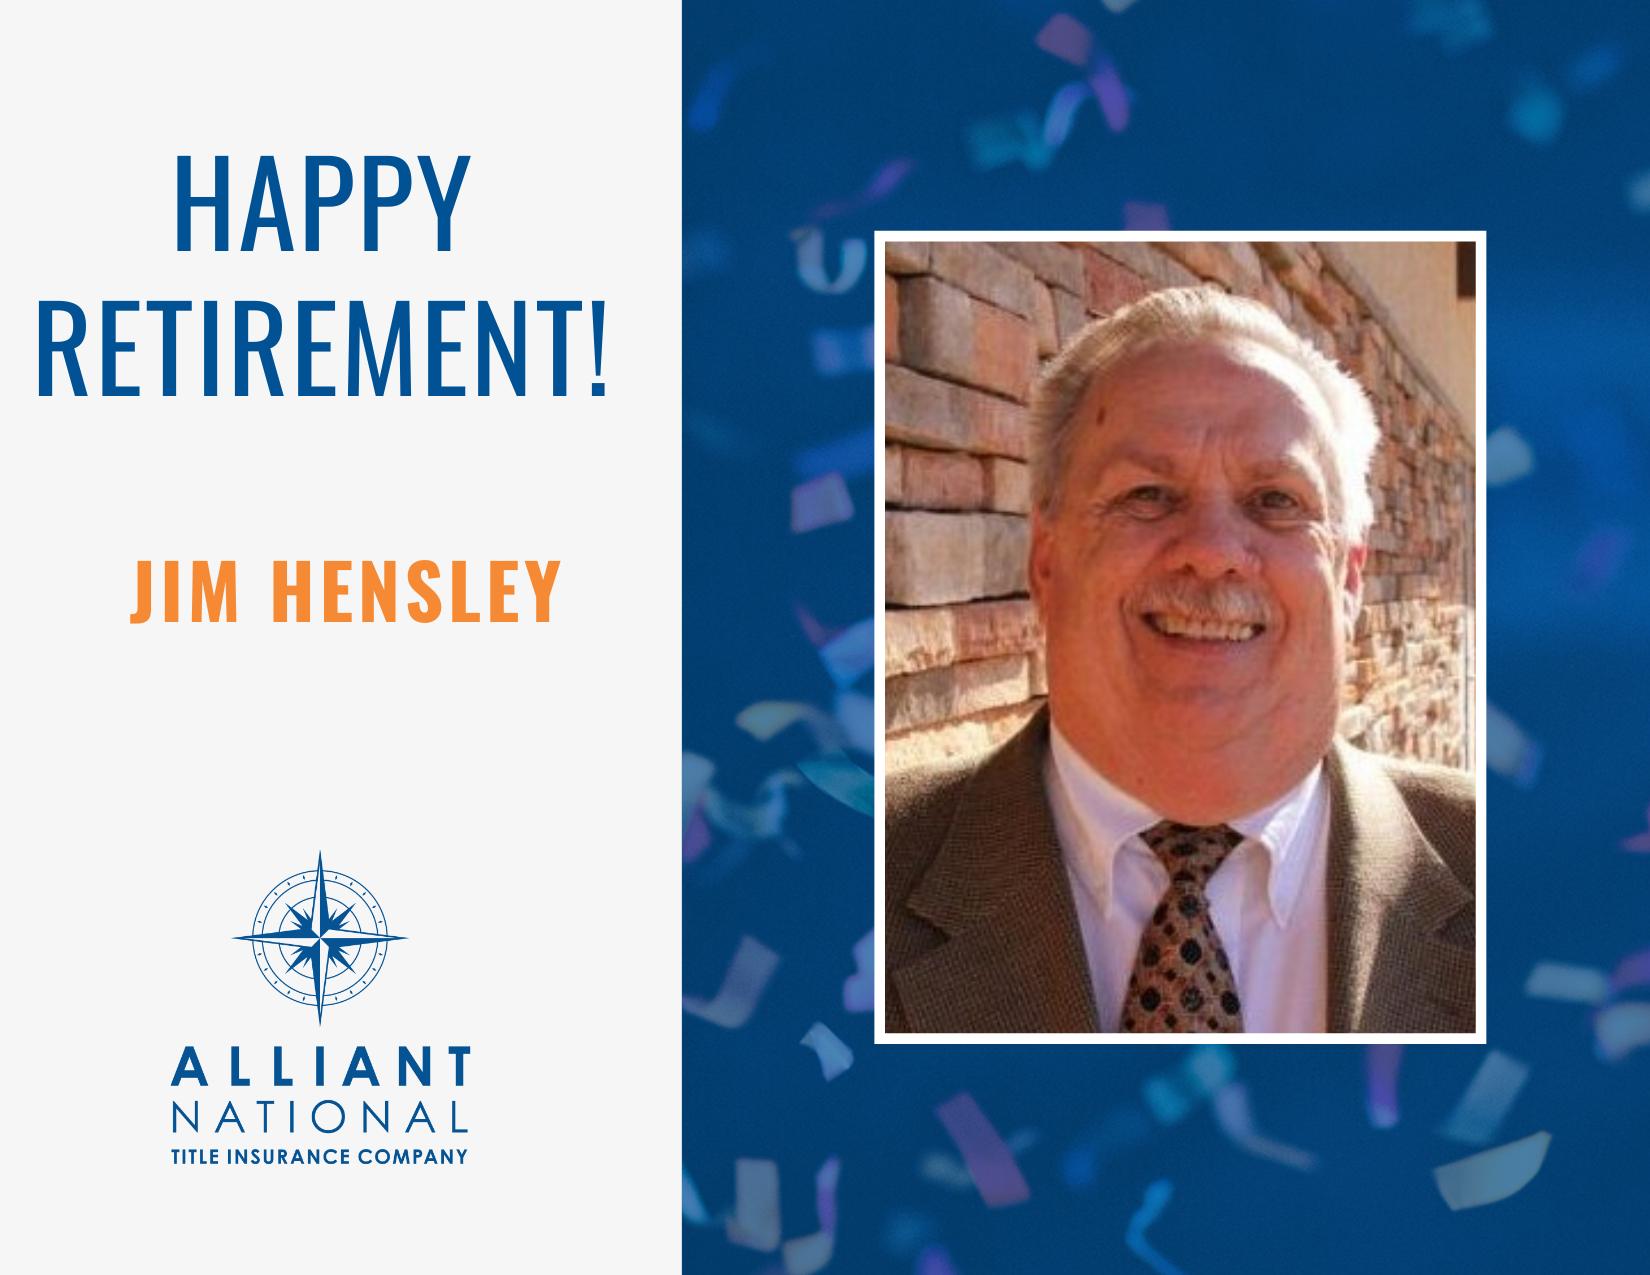 Happy Retirement to Jim Hensley